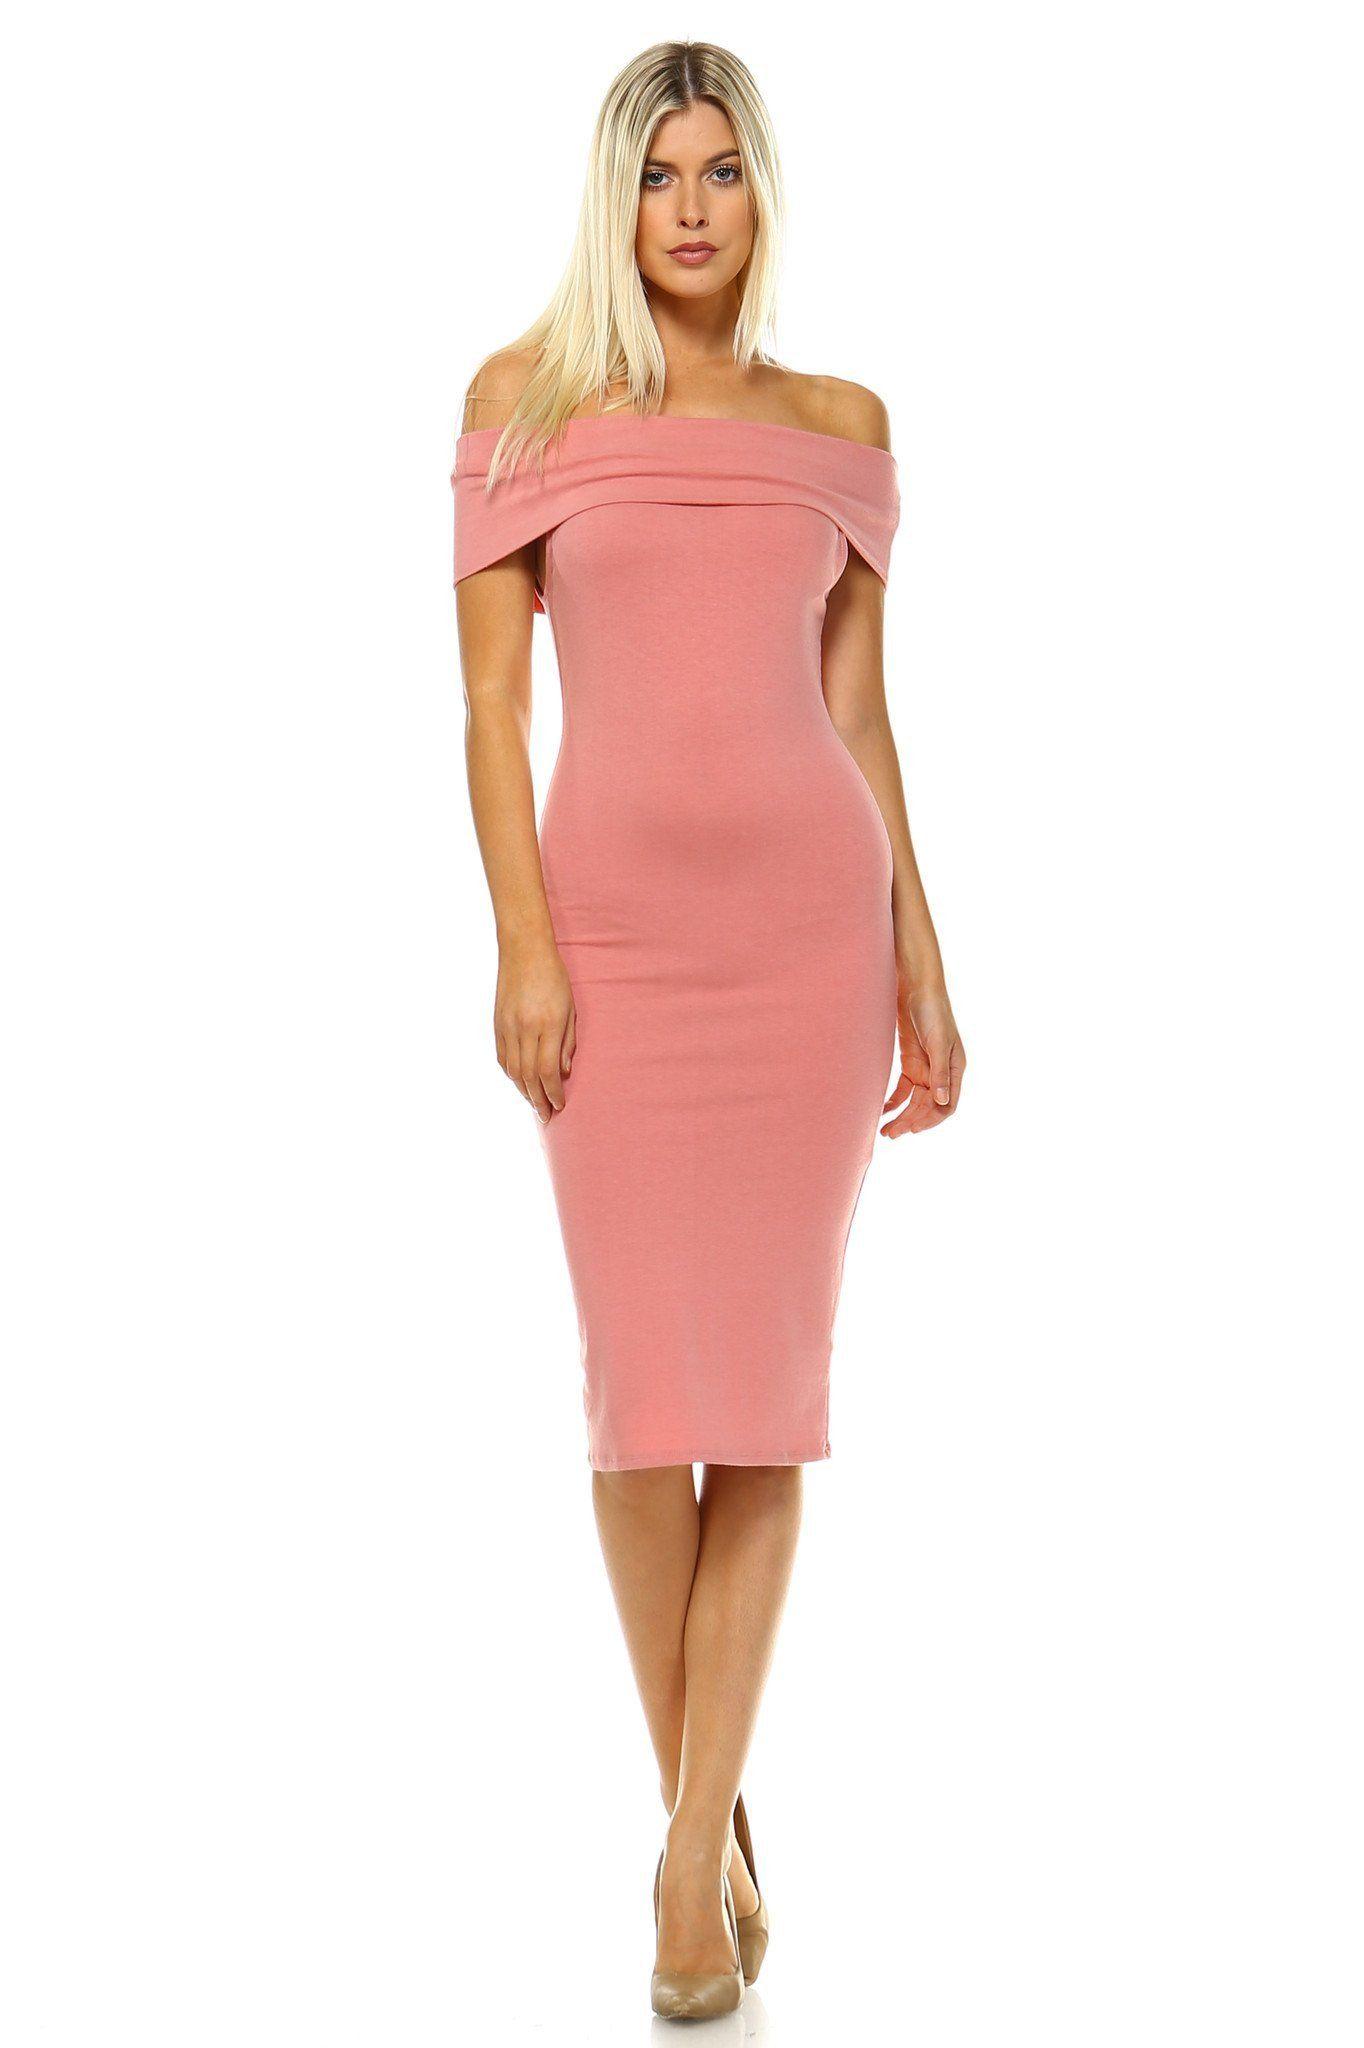 Women s Off Shoulder Bodycon Dress 3 colors and 3 sizes  439768d747